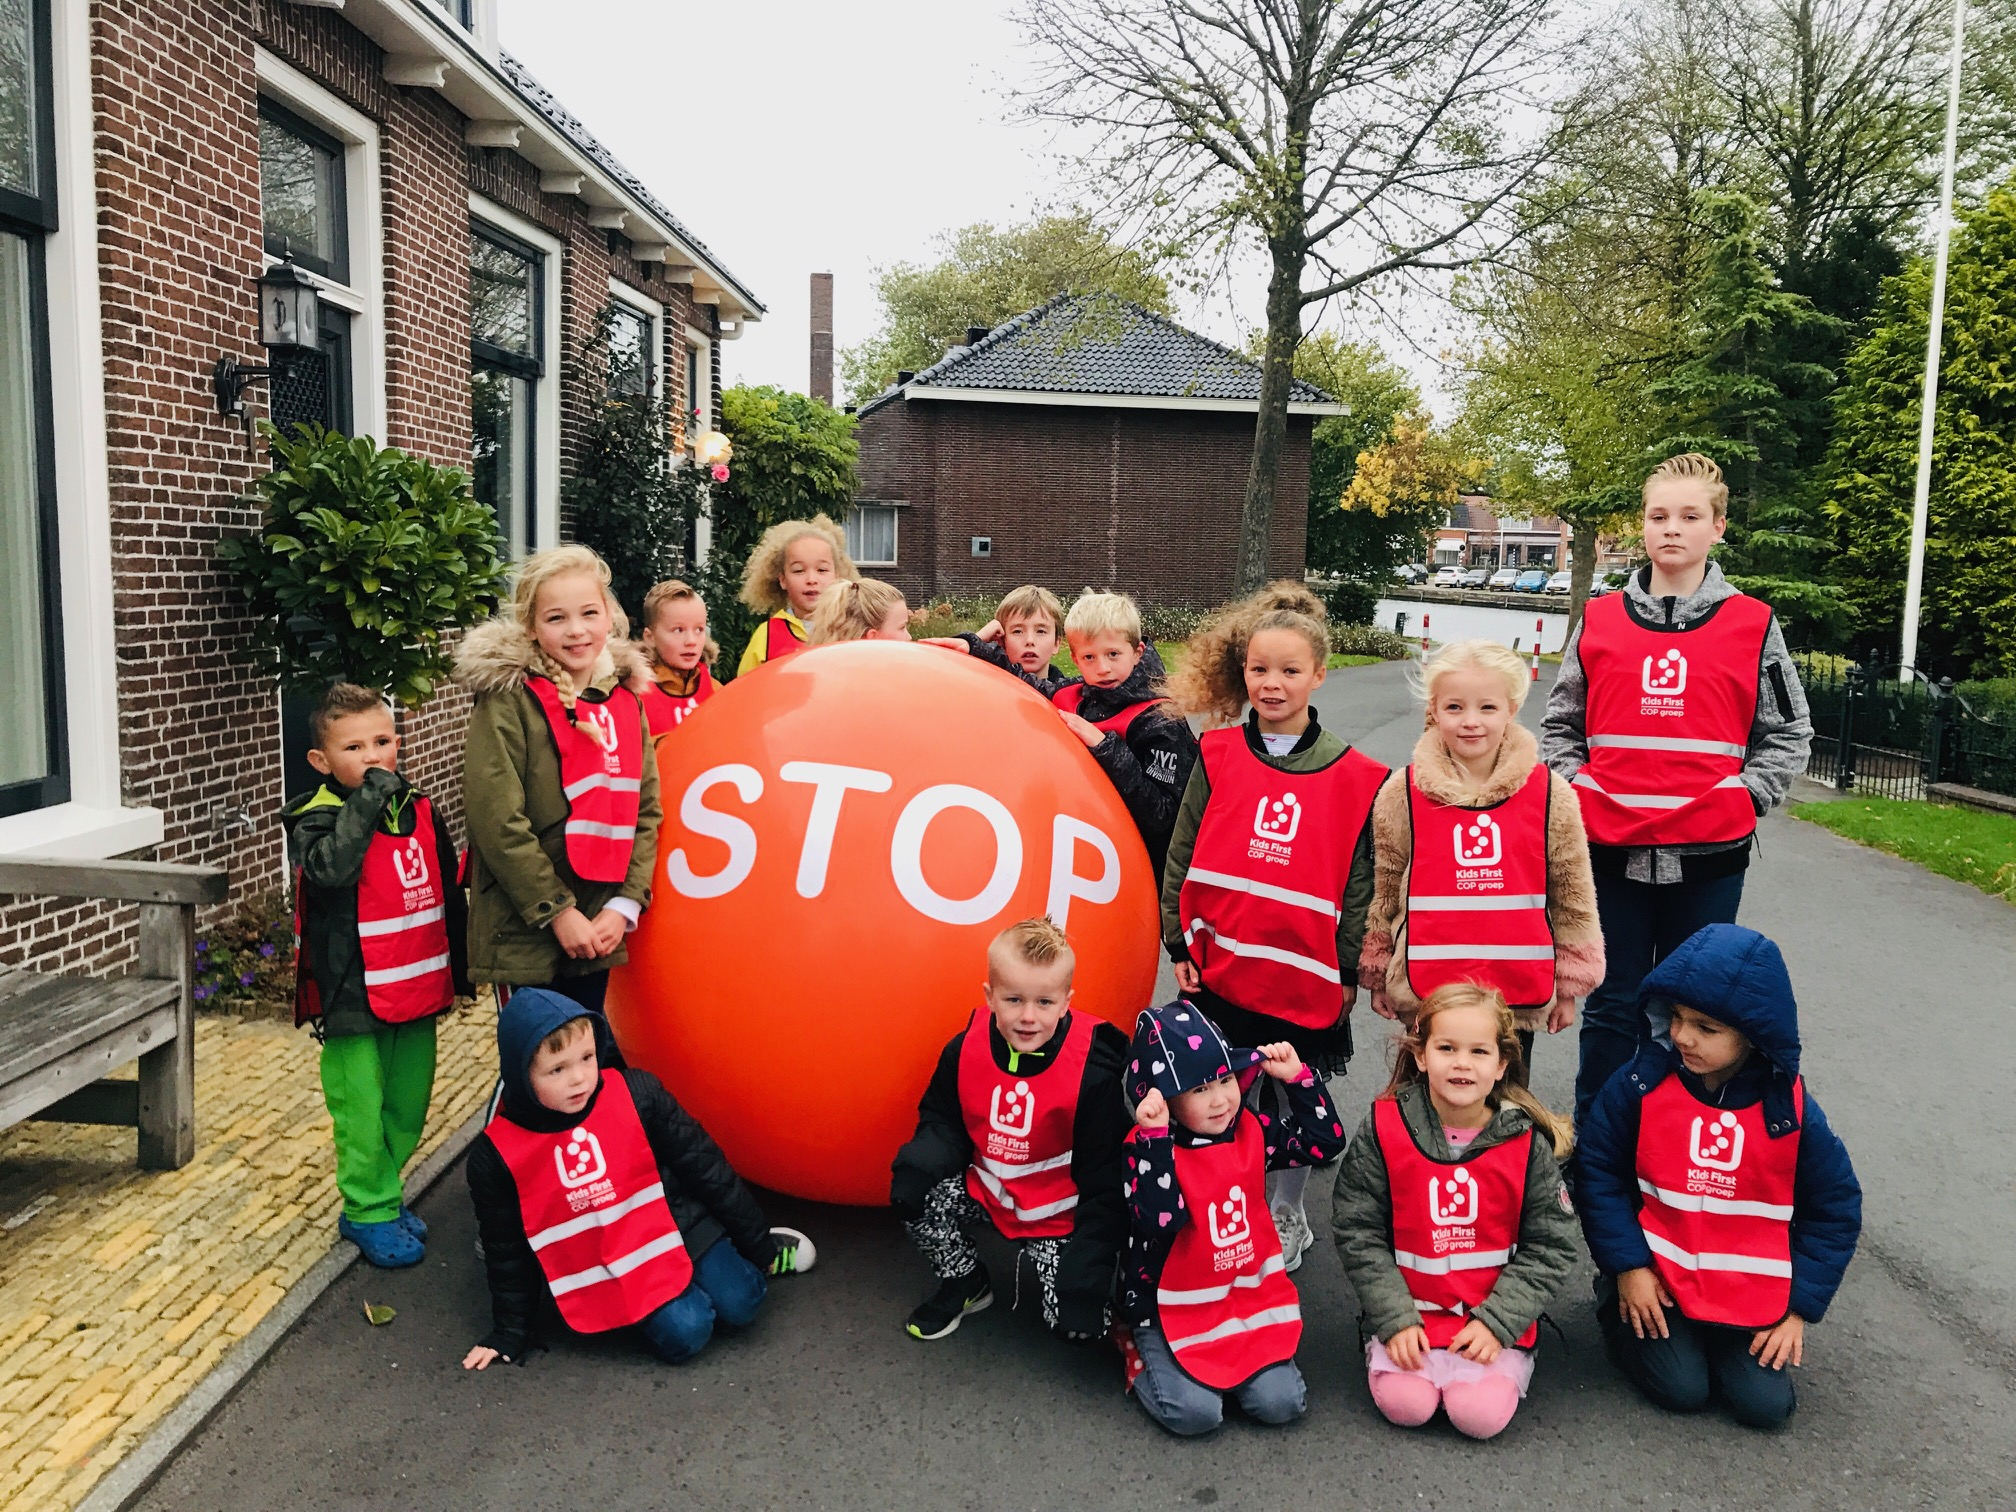 Rollen tegen roken -2018 Kids First COP groep Friesland - 5